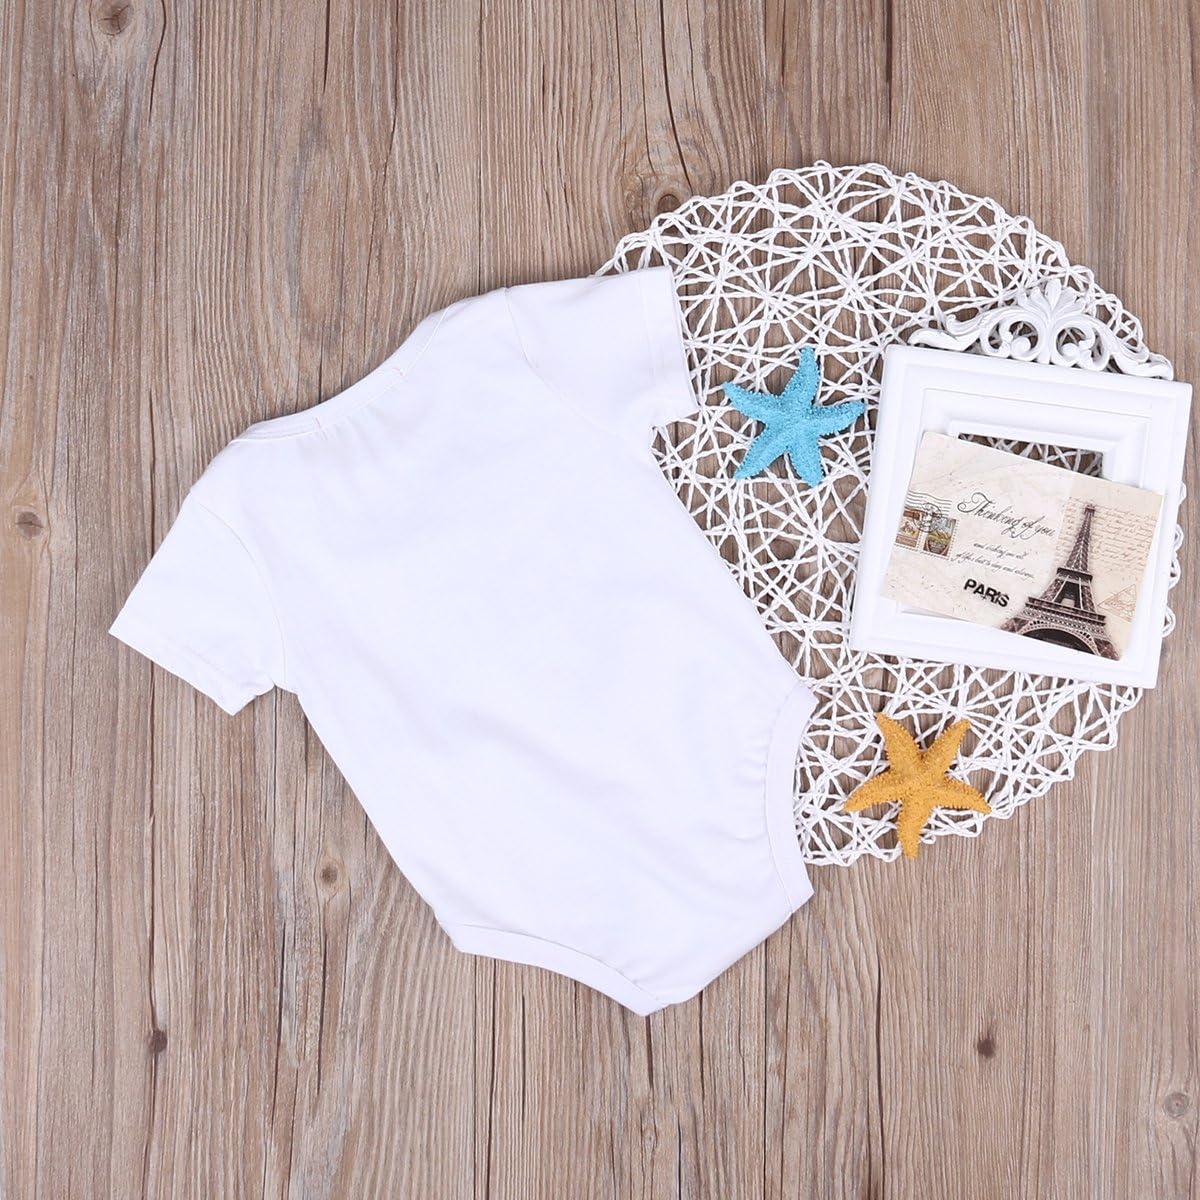 Neugeborenes Baby M/ädchen Strampler Tops Hemd Big Sister /& Little Brother Outfits Set Kleidung